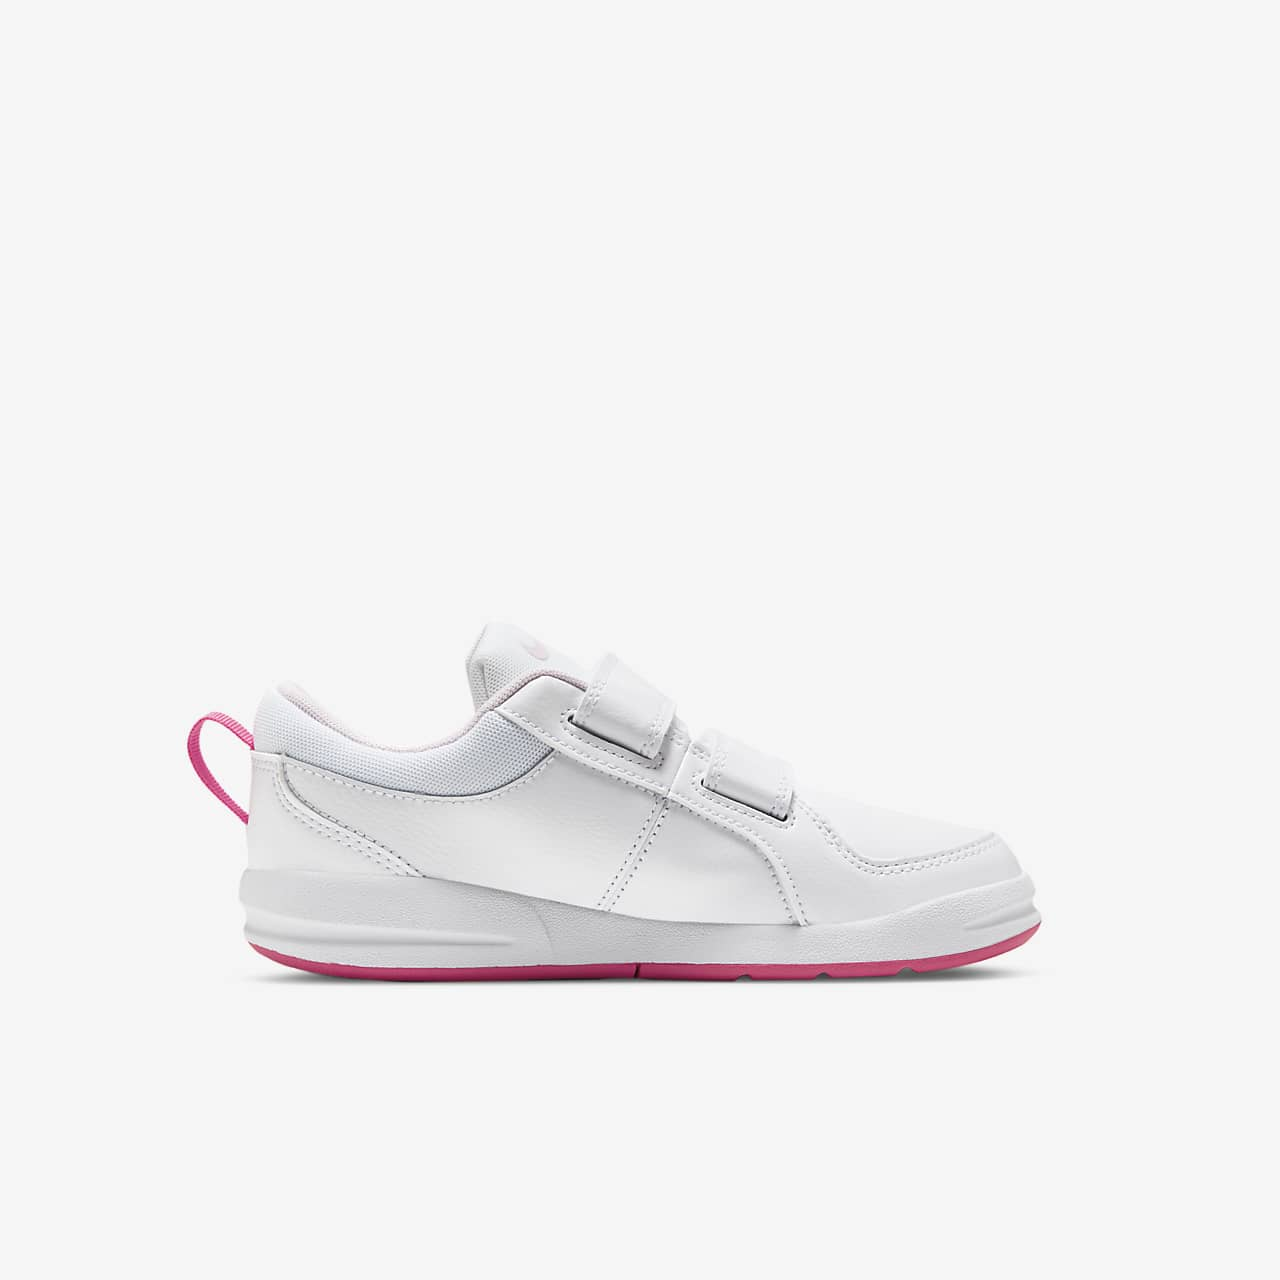 73c97f00df4 ... Sapatilhas Nike Pico 4 para rapariga (27